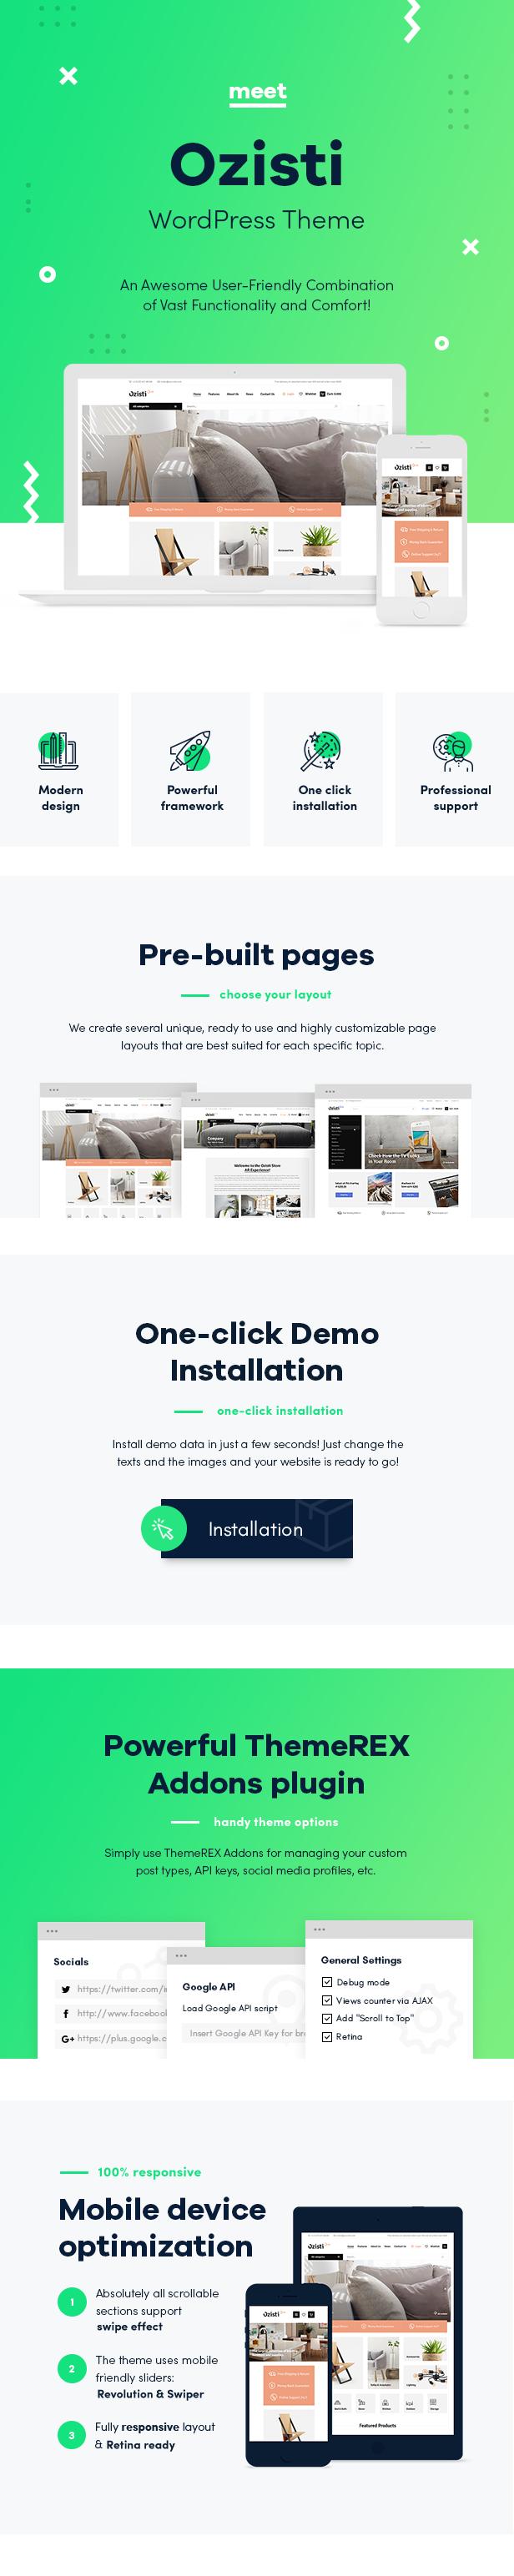 Ozisti | A Multi-Concept WooCommerce WordPress Theme Augmented Reality Store Ready - 3